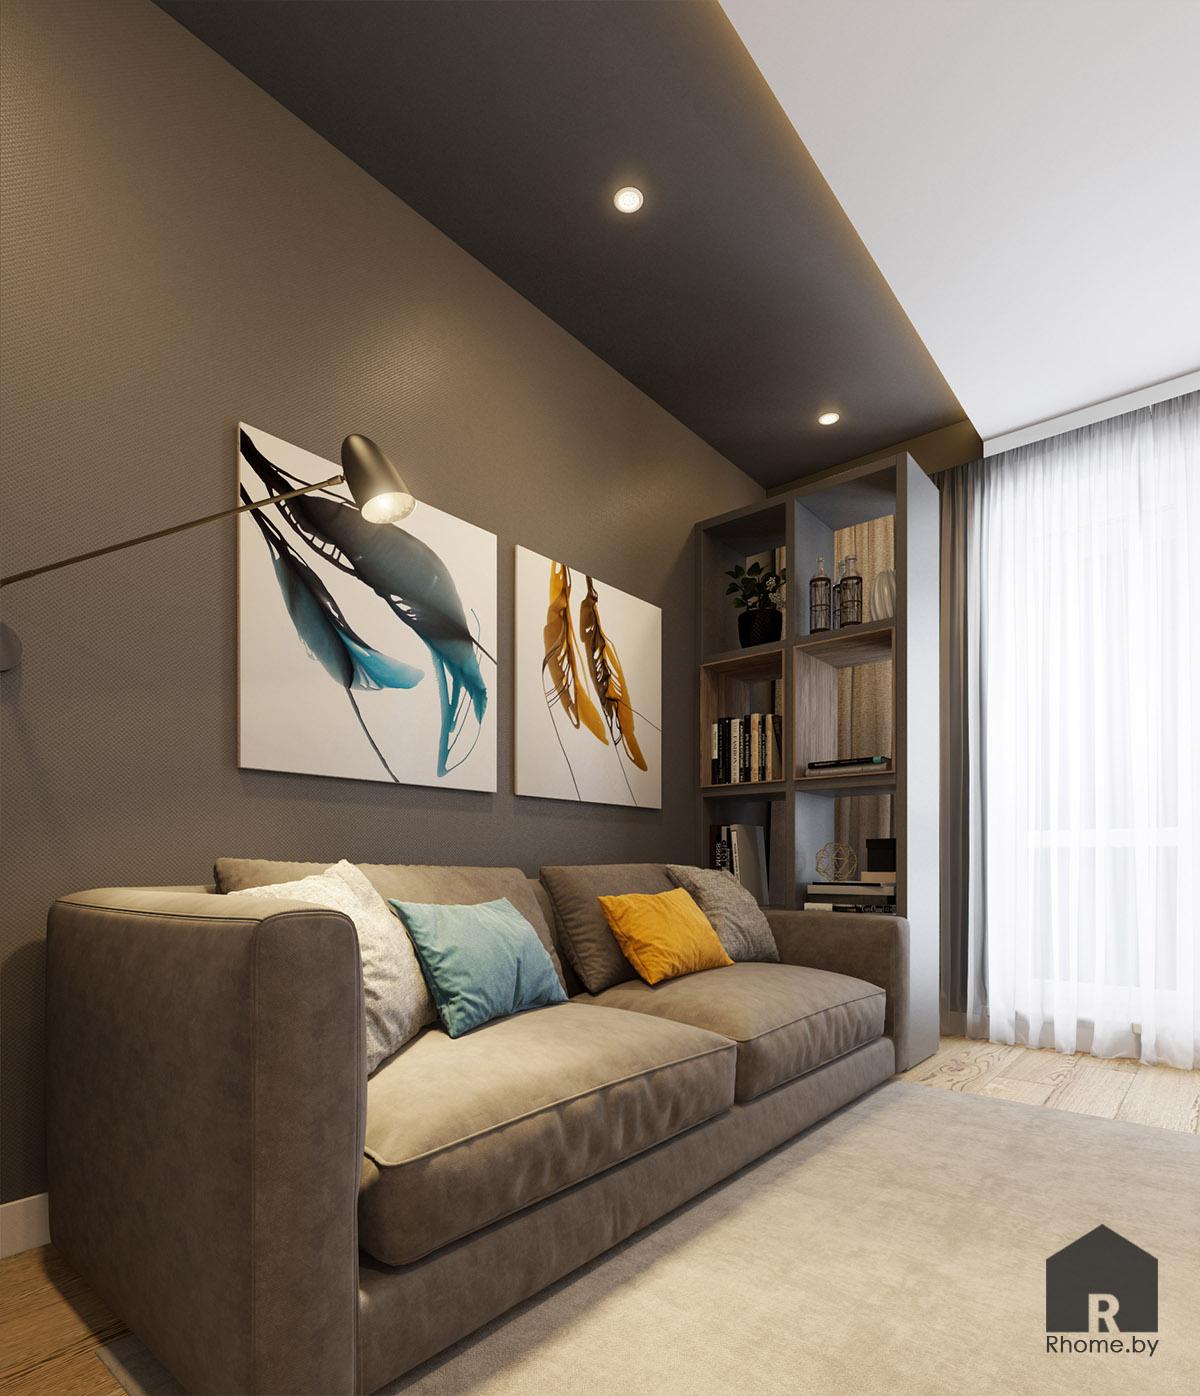 Дизайн кабинета на ул. Беломорская | Дизайн студия – Rhome.by